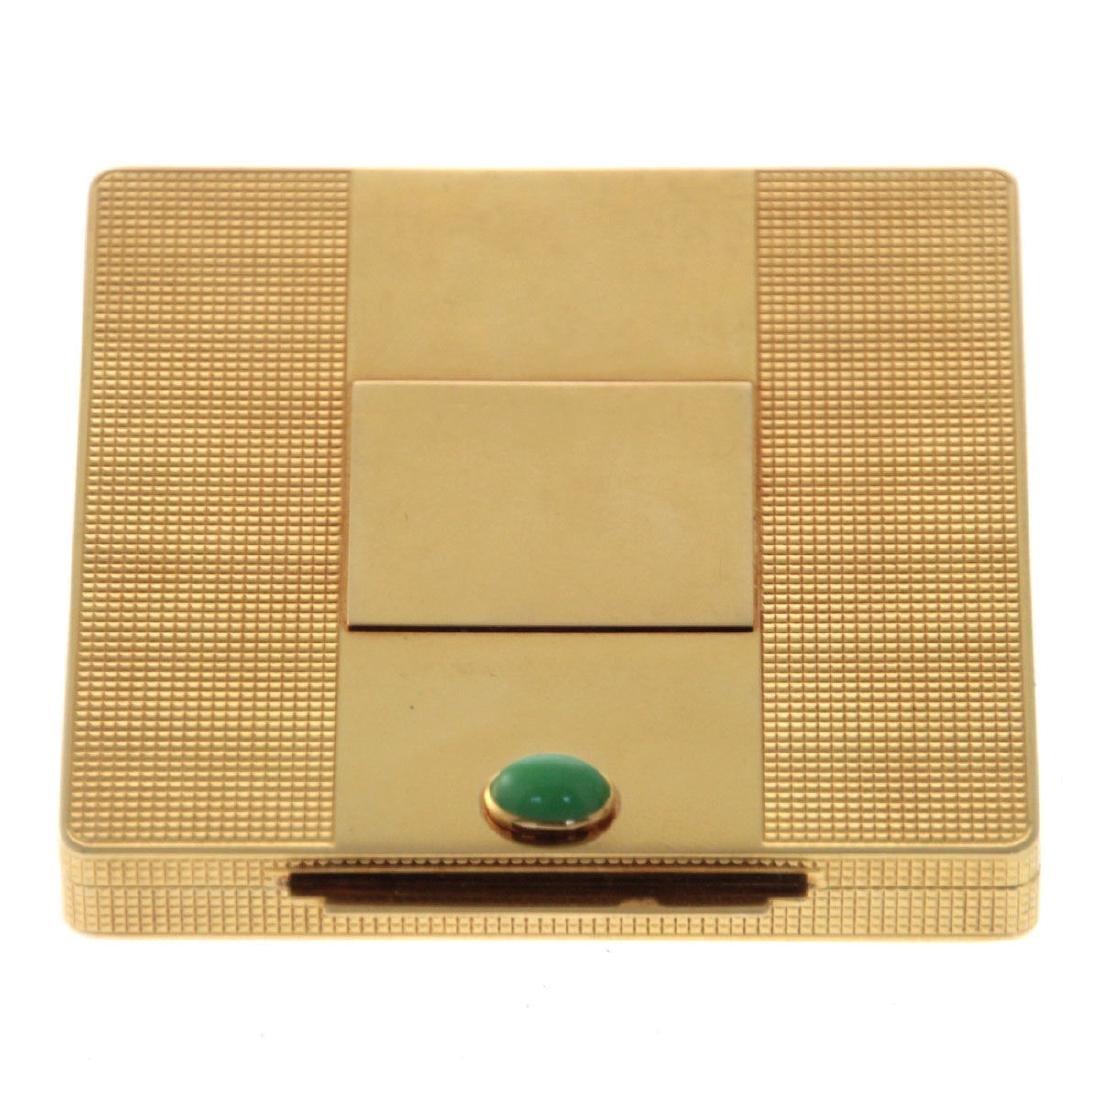 Cartier 18k Gold Powder Case Compact.